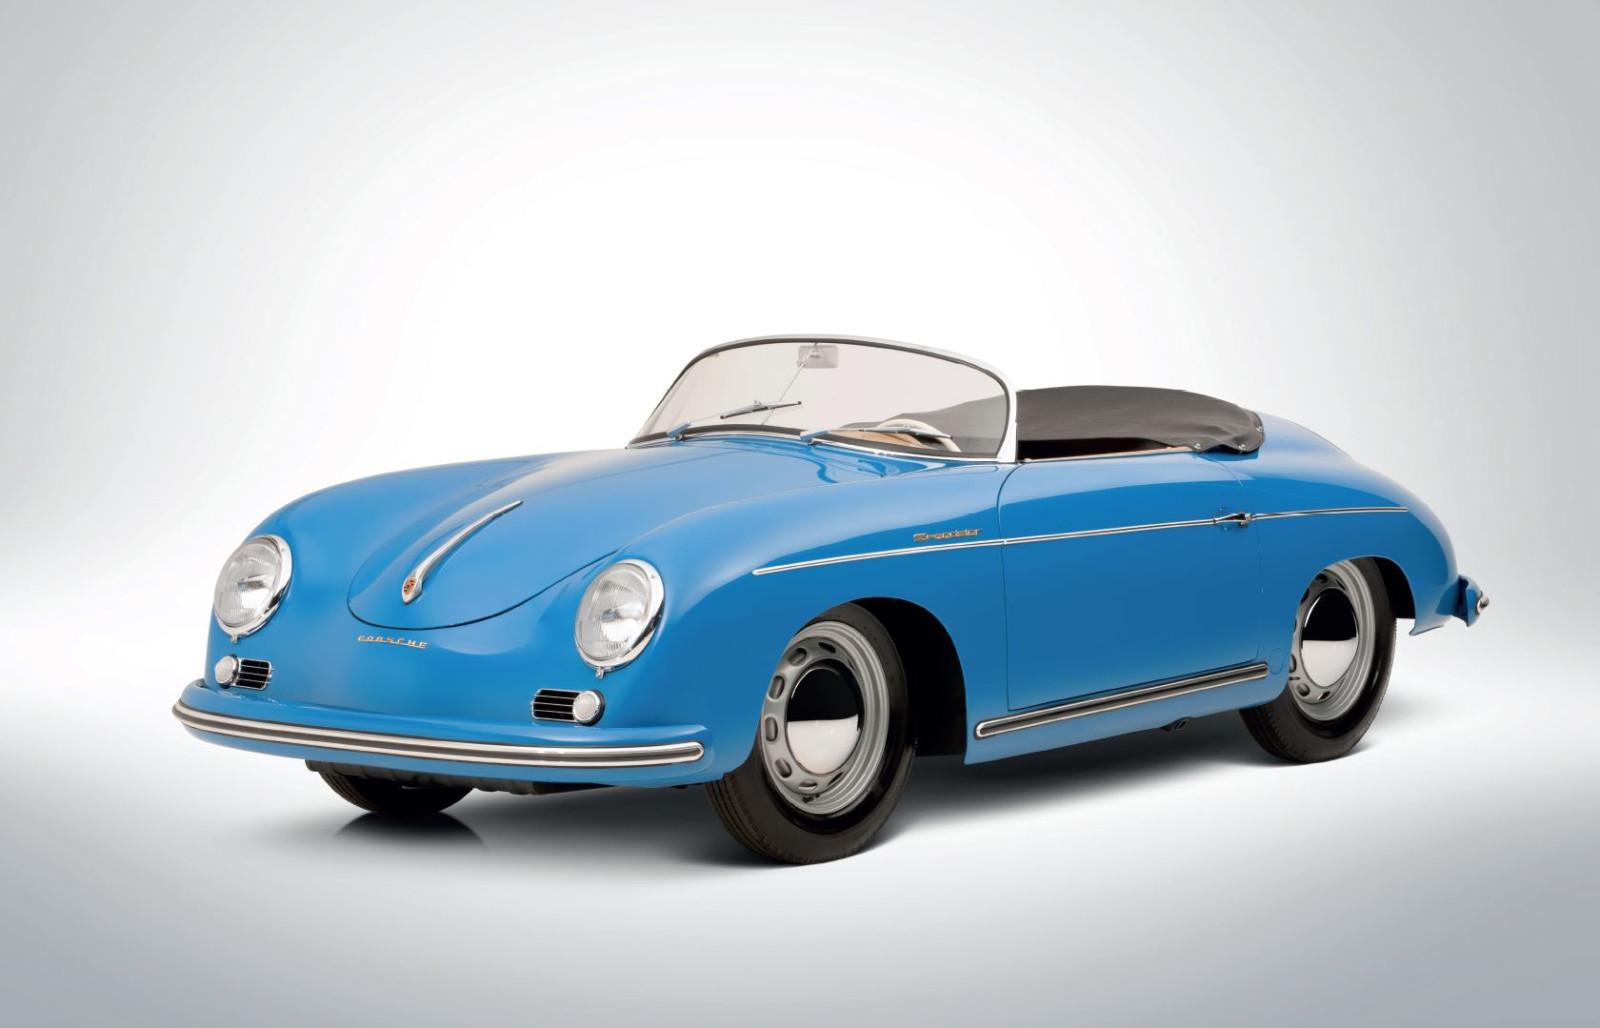 Porsche 356 Pre-A 1500 Speedster